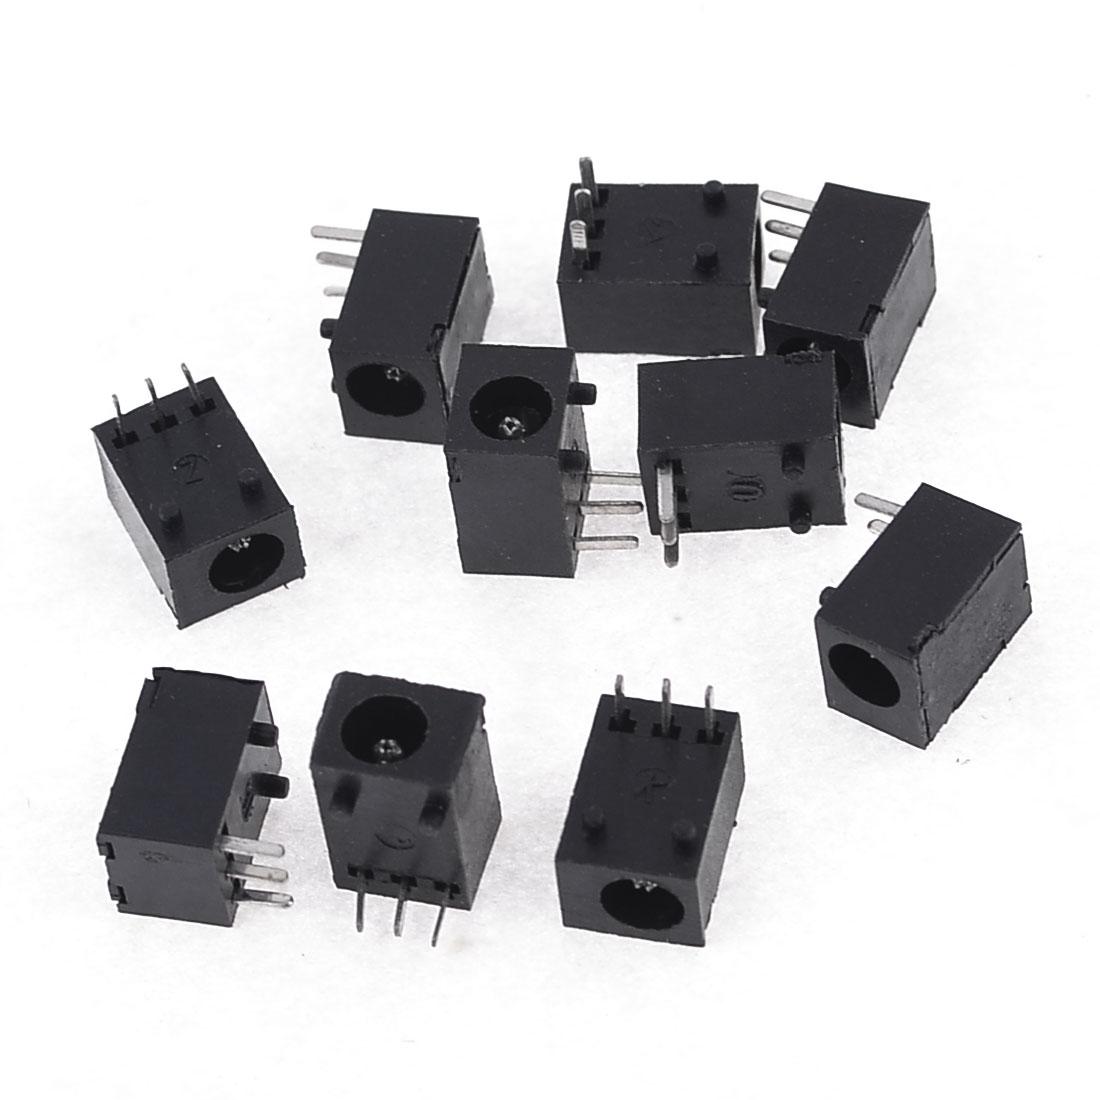 10pcs 3.5mm Dia PCB DC Power Jacks Sockets Charge Ports